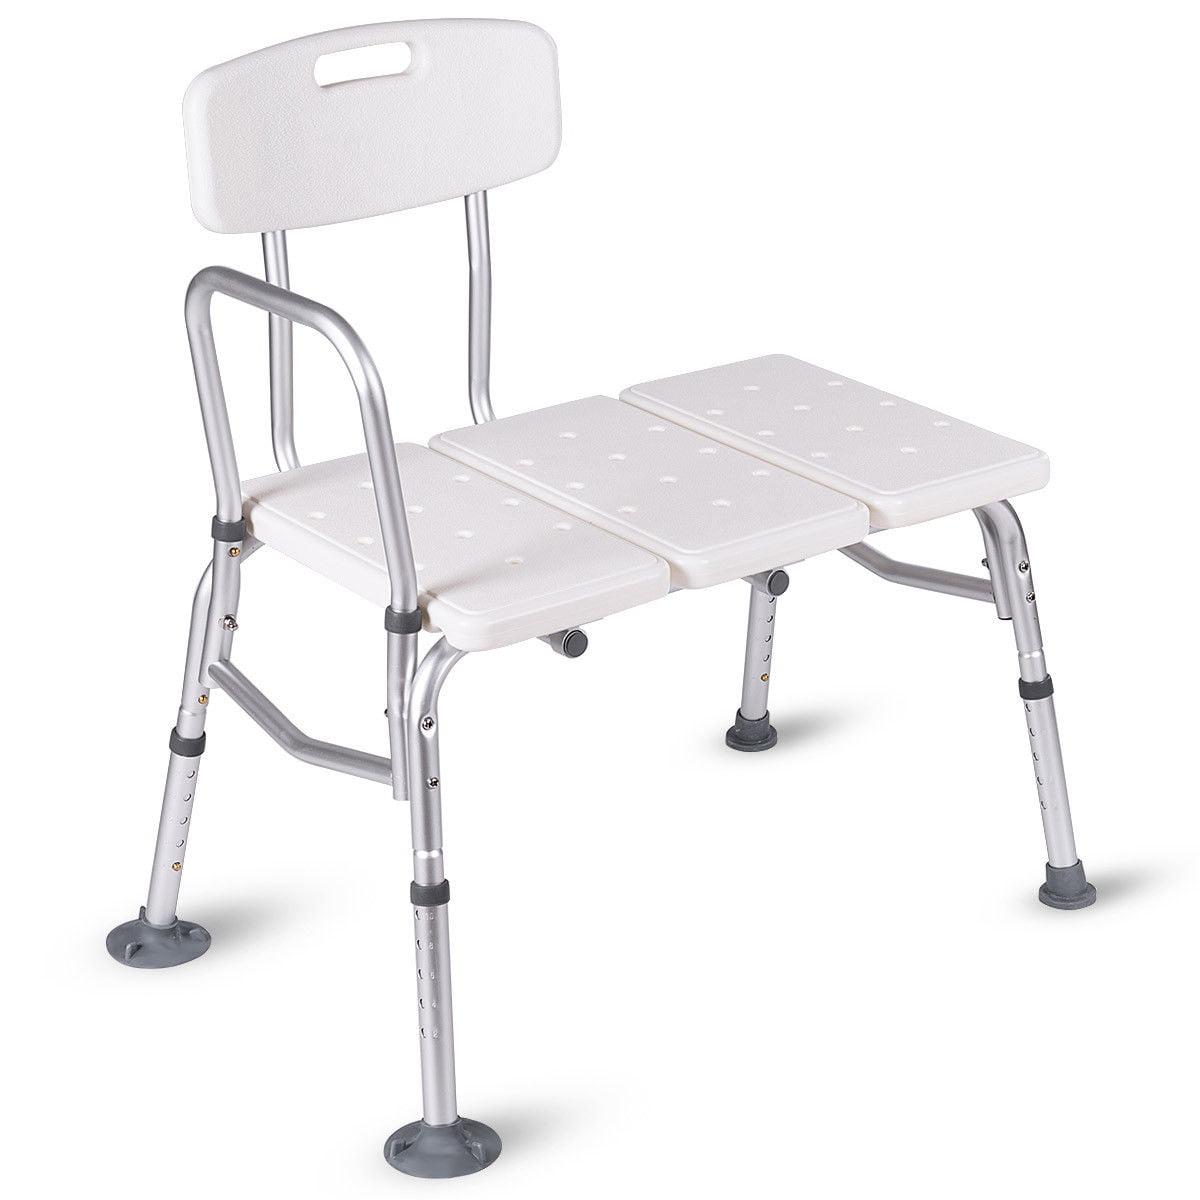 SHIRONI Shower Chair 10 Height Adjustable Bathtub Medical Shower Transfer Bench Bath